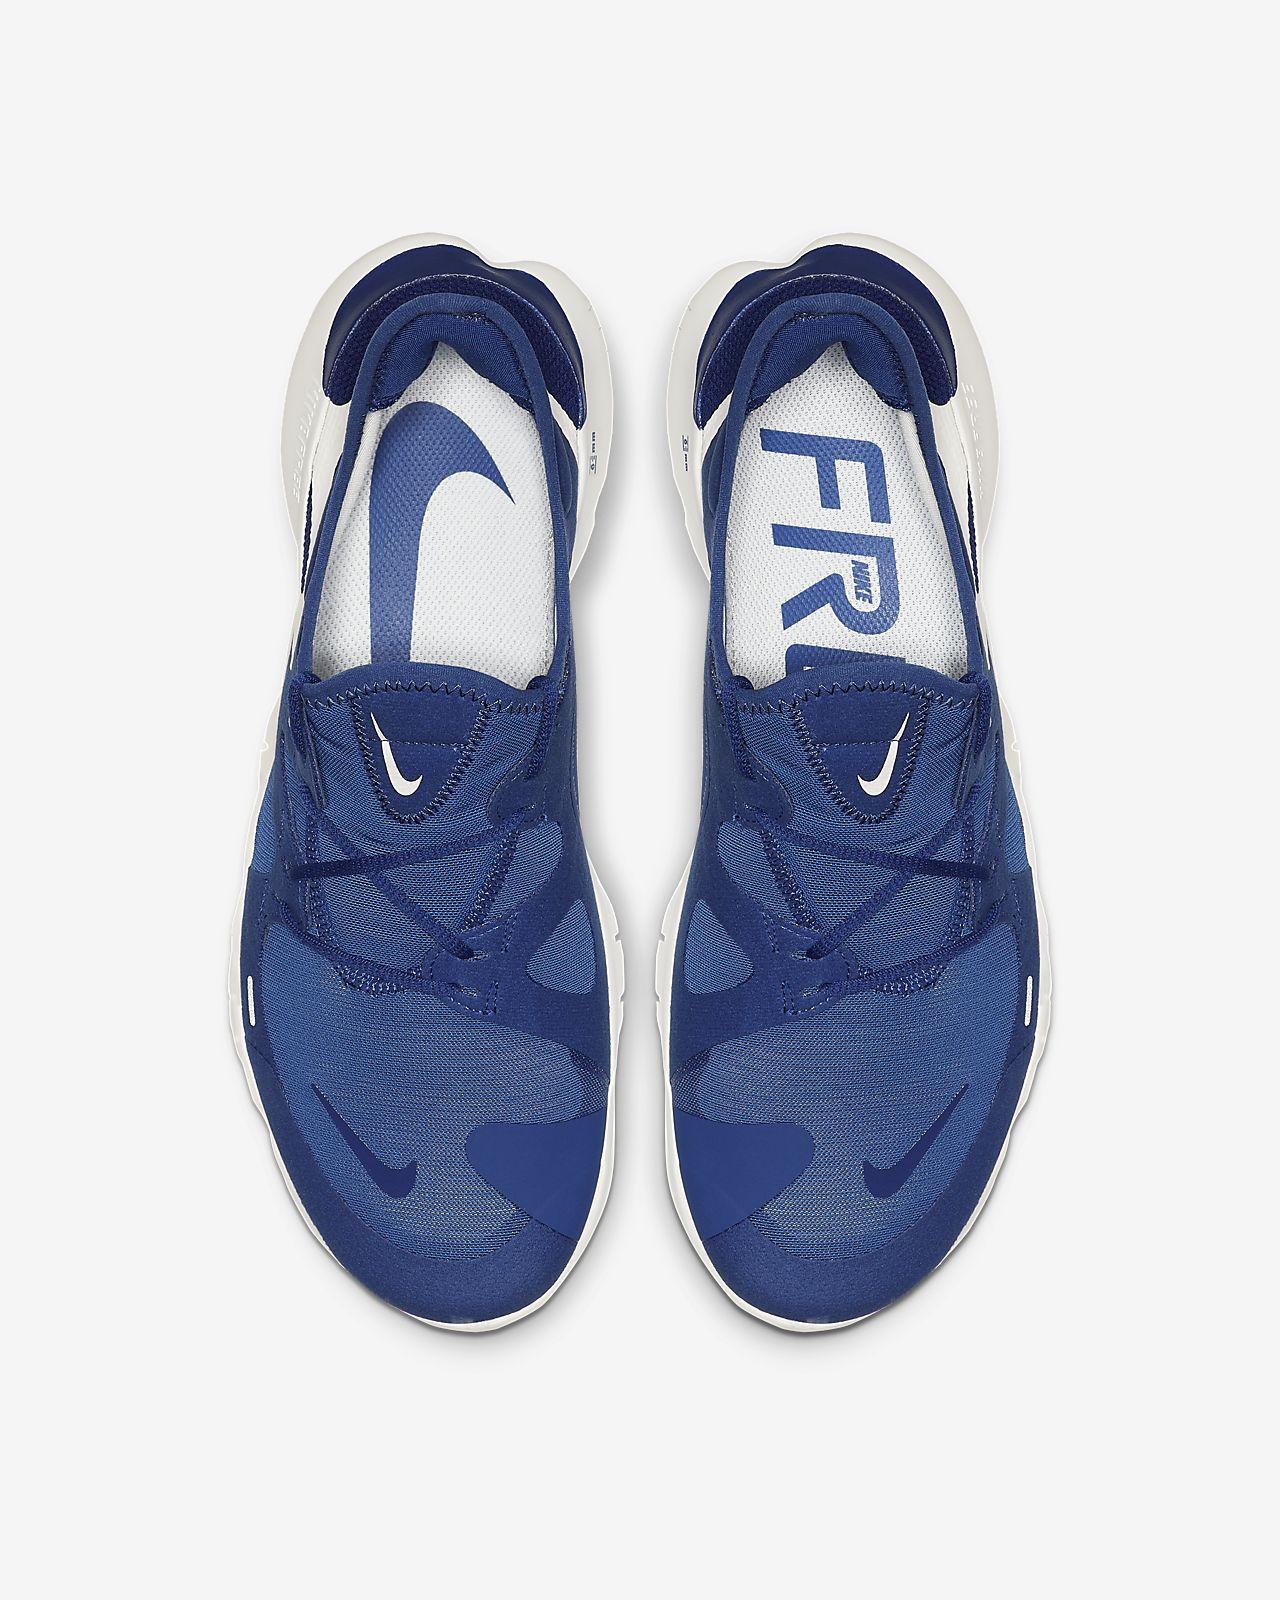 64ebf4f76b9ed Nike Free RN 5.0 Men s Running Shoe. Nike.com NL